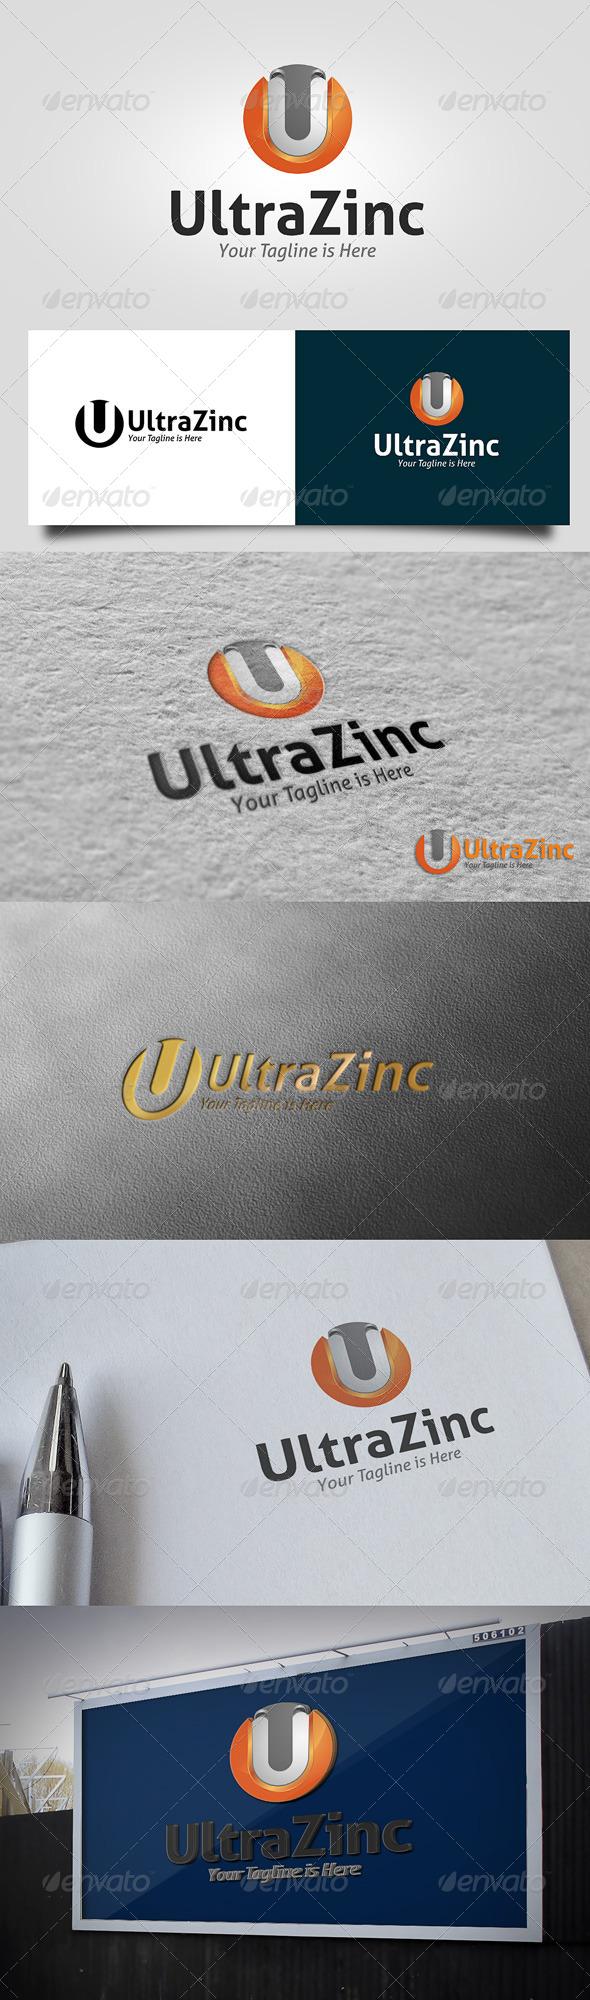 GraphicRiver Ultrazinc Logo 5766628